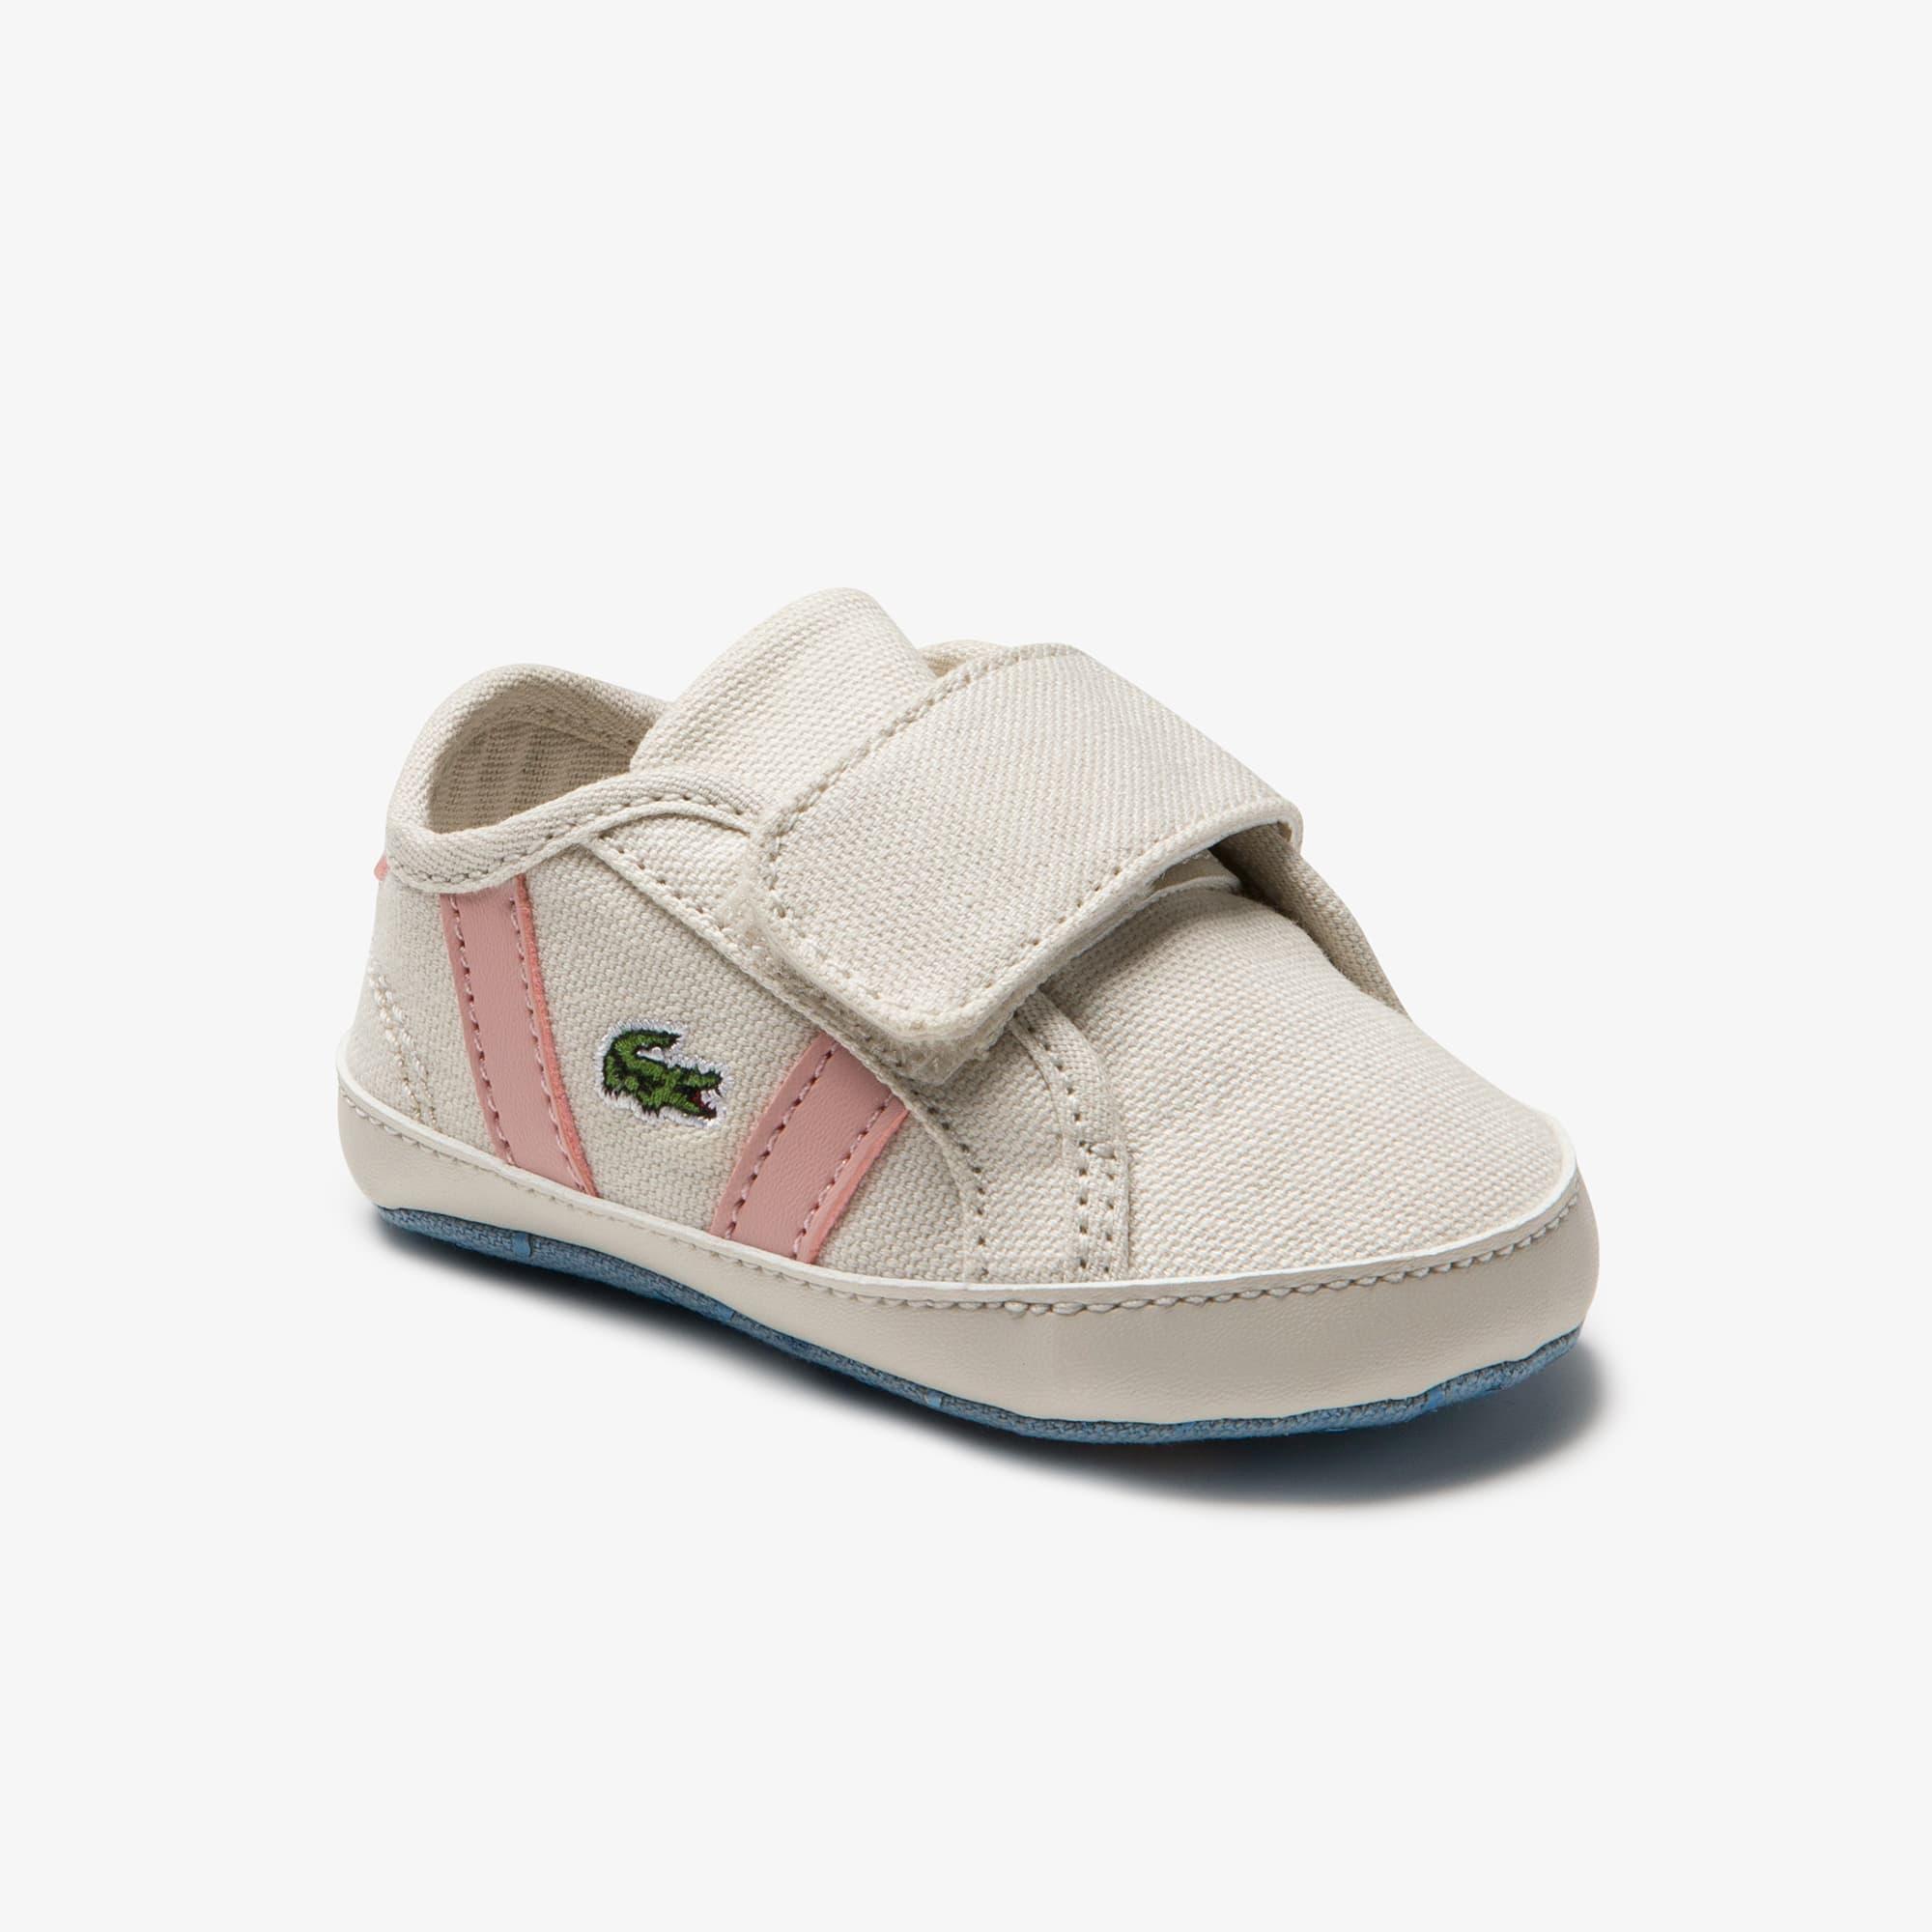 Lacoste Sneakers Sideline bébé en toile Taille 15 Off White/light Pink